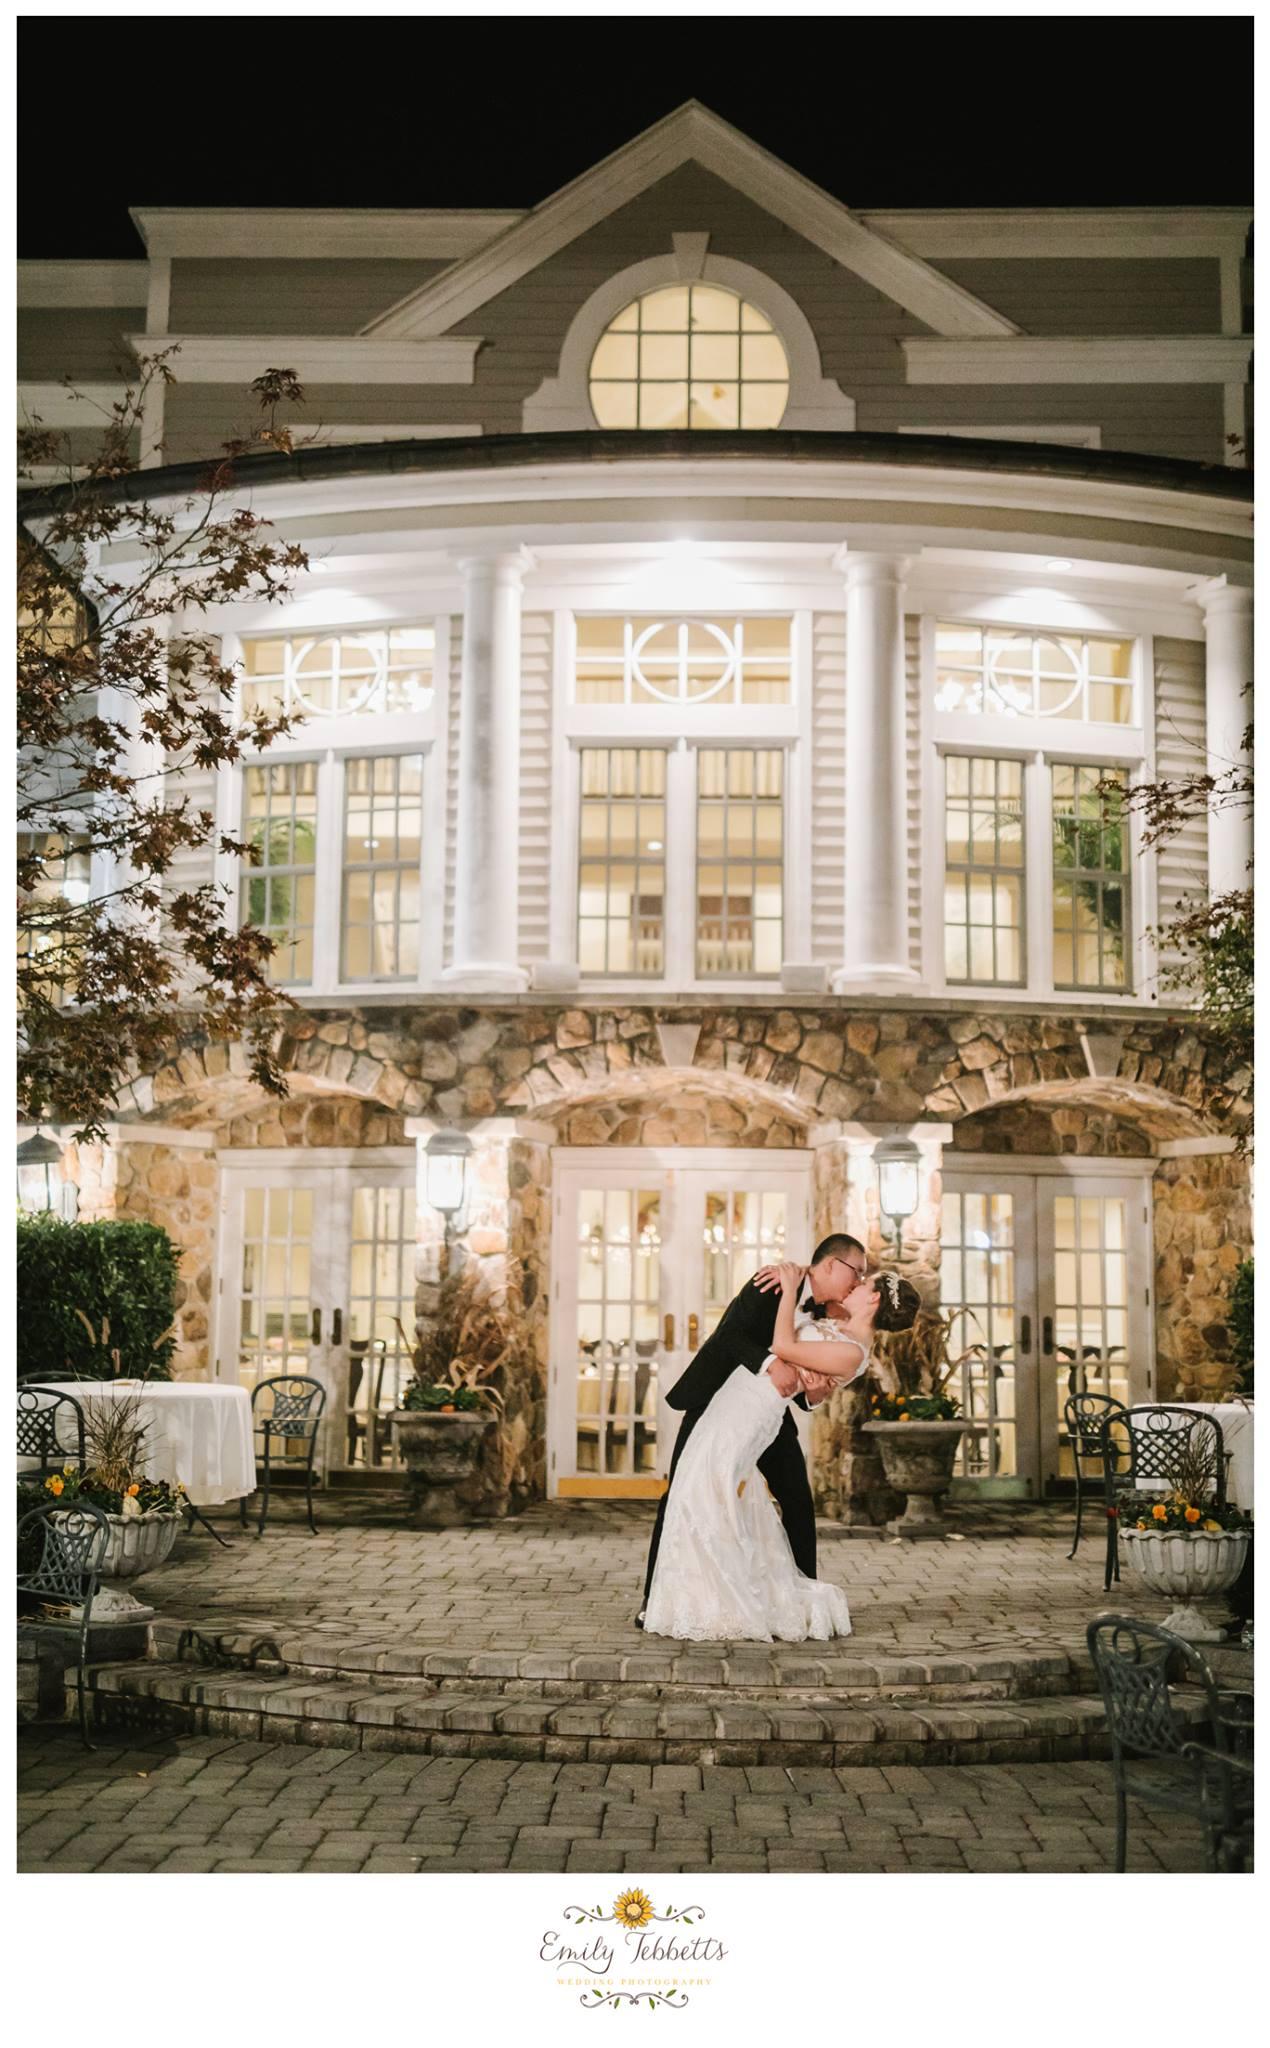 Basking Ridge, NJ - Emily Tebbetts Wedding Photography 6.jpg